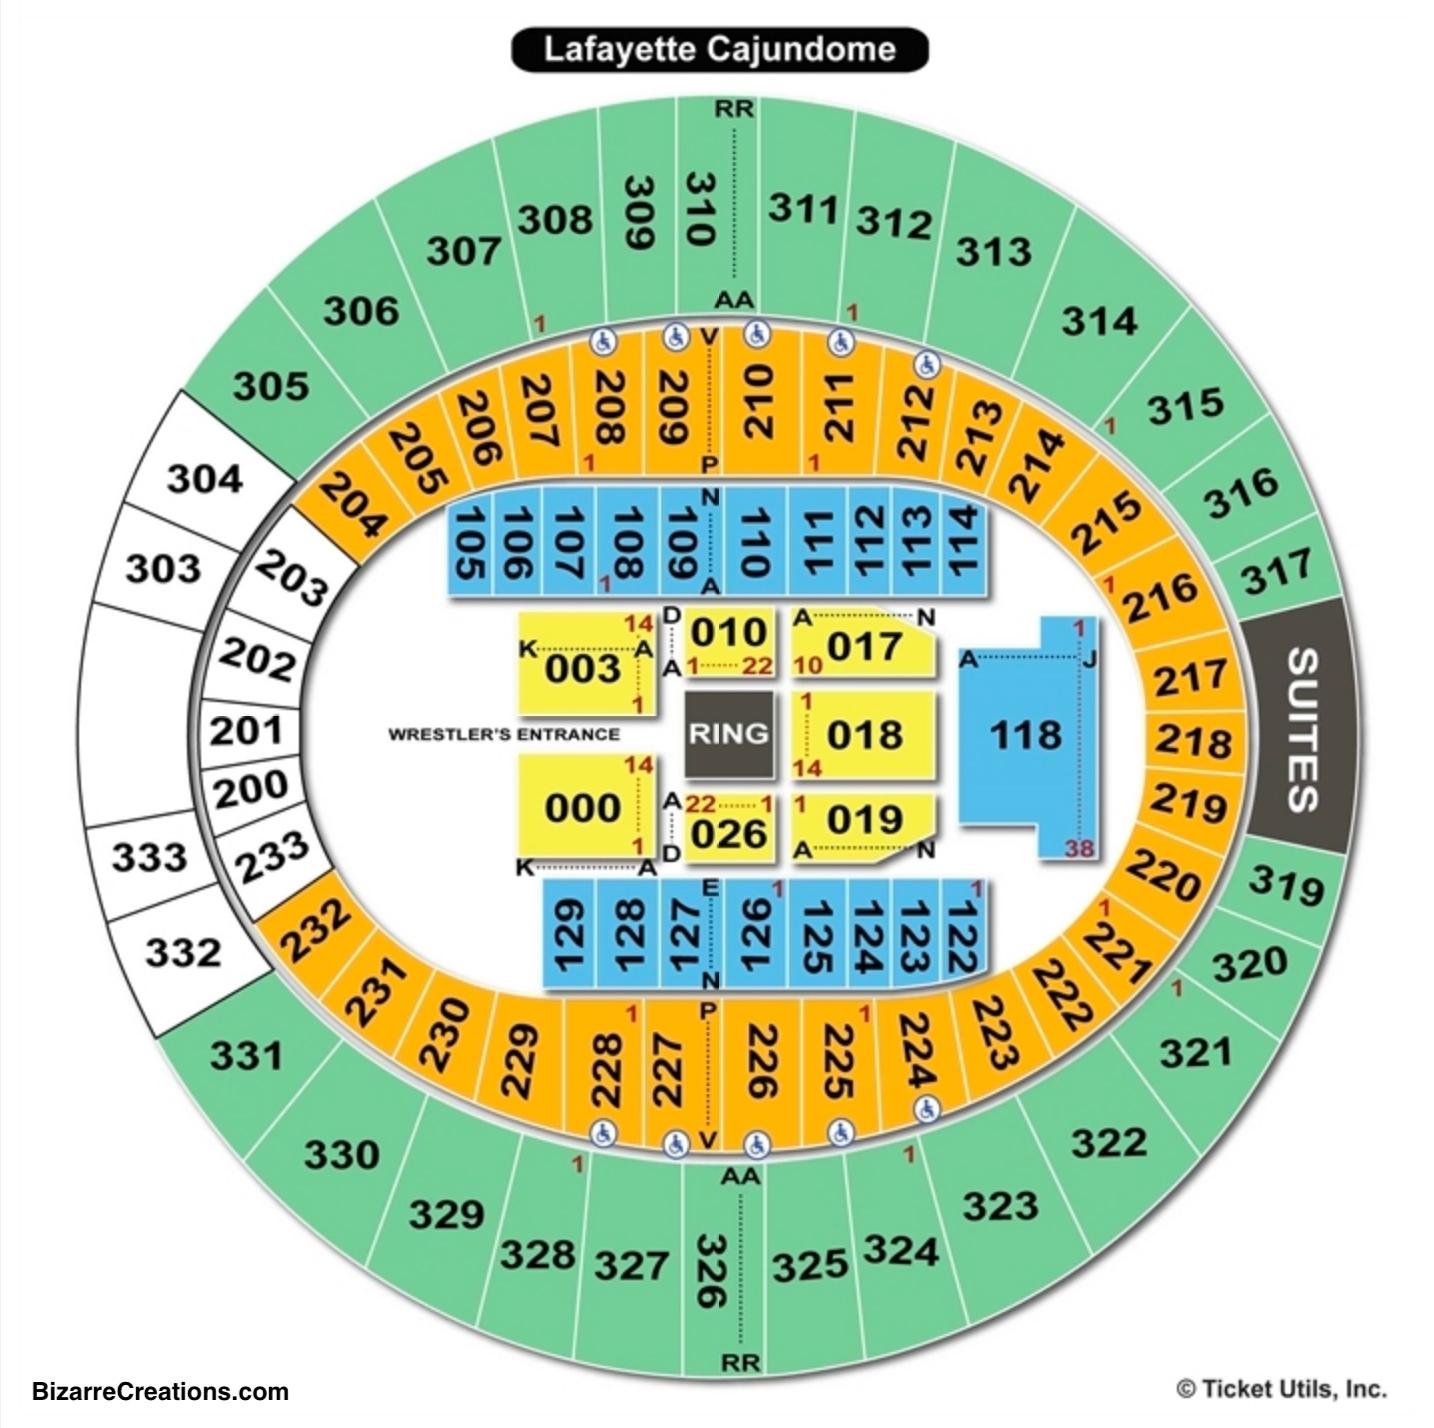 Cajundome Seating Chart WWE